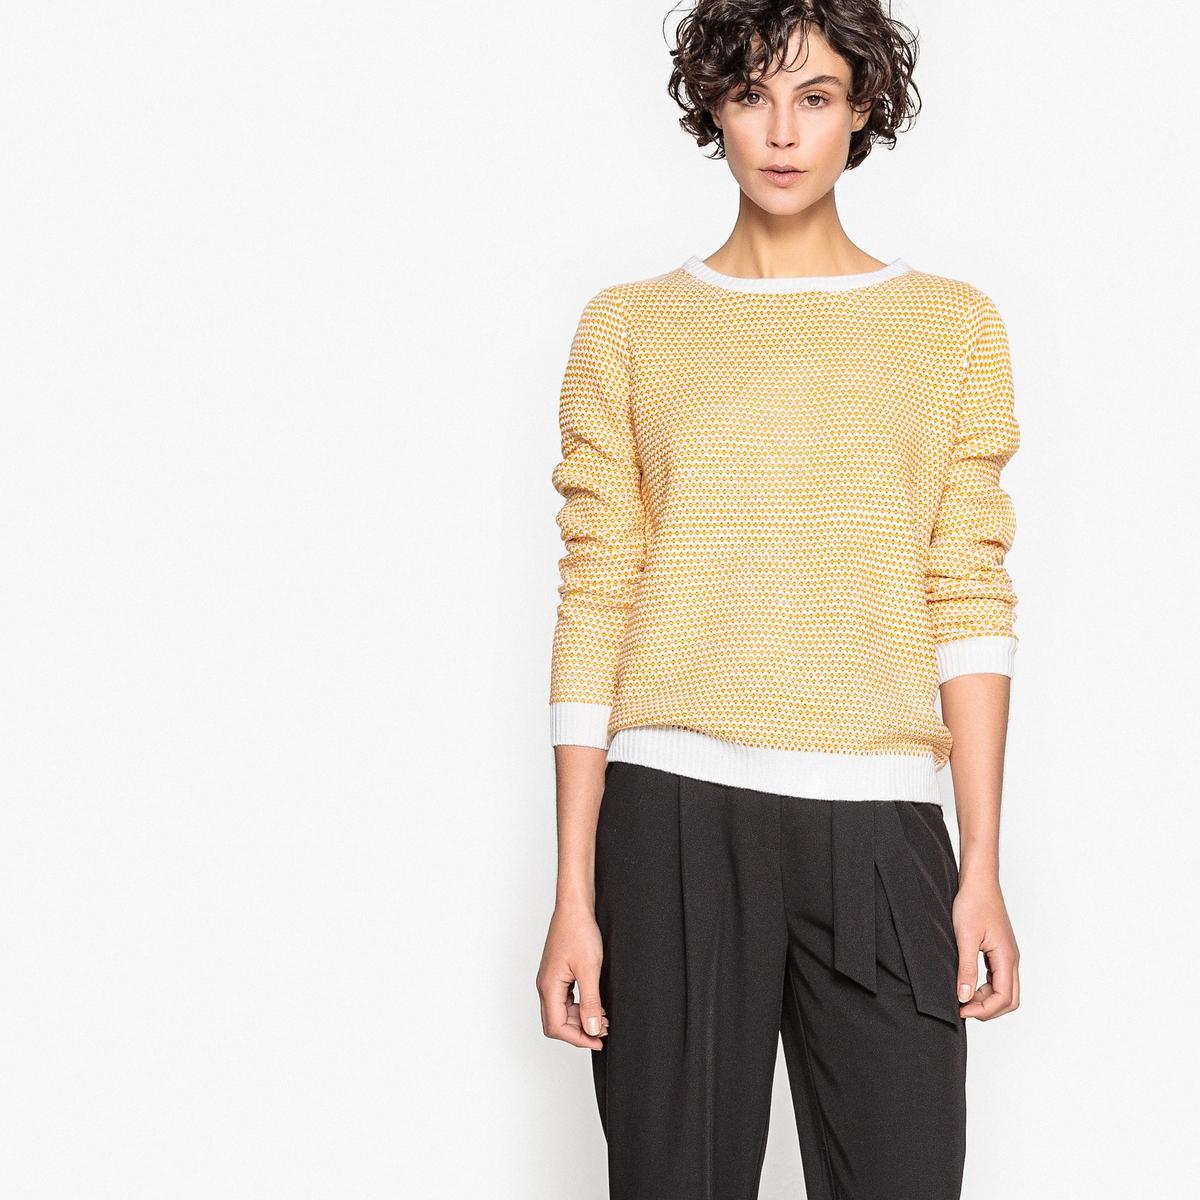 Пуловер MADEMOISELLE R 6146770 от LaRedoute